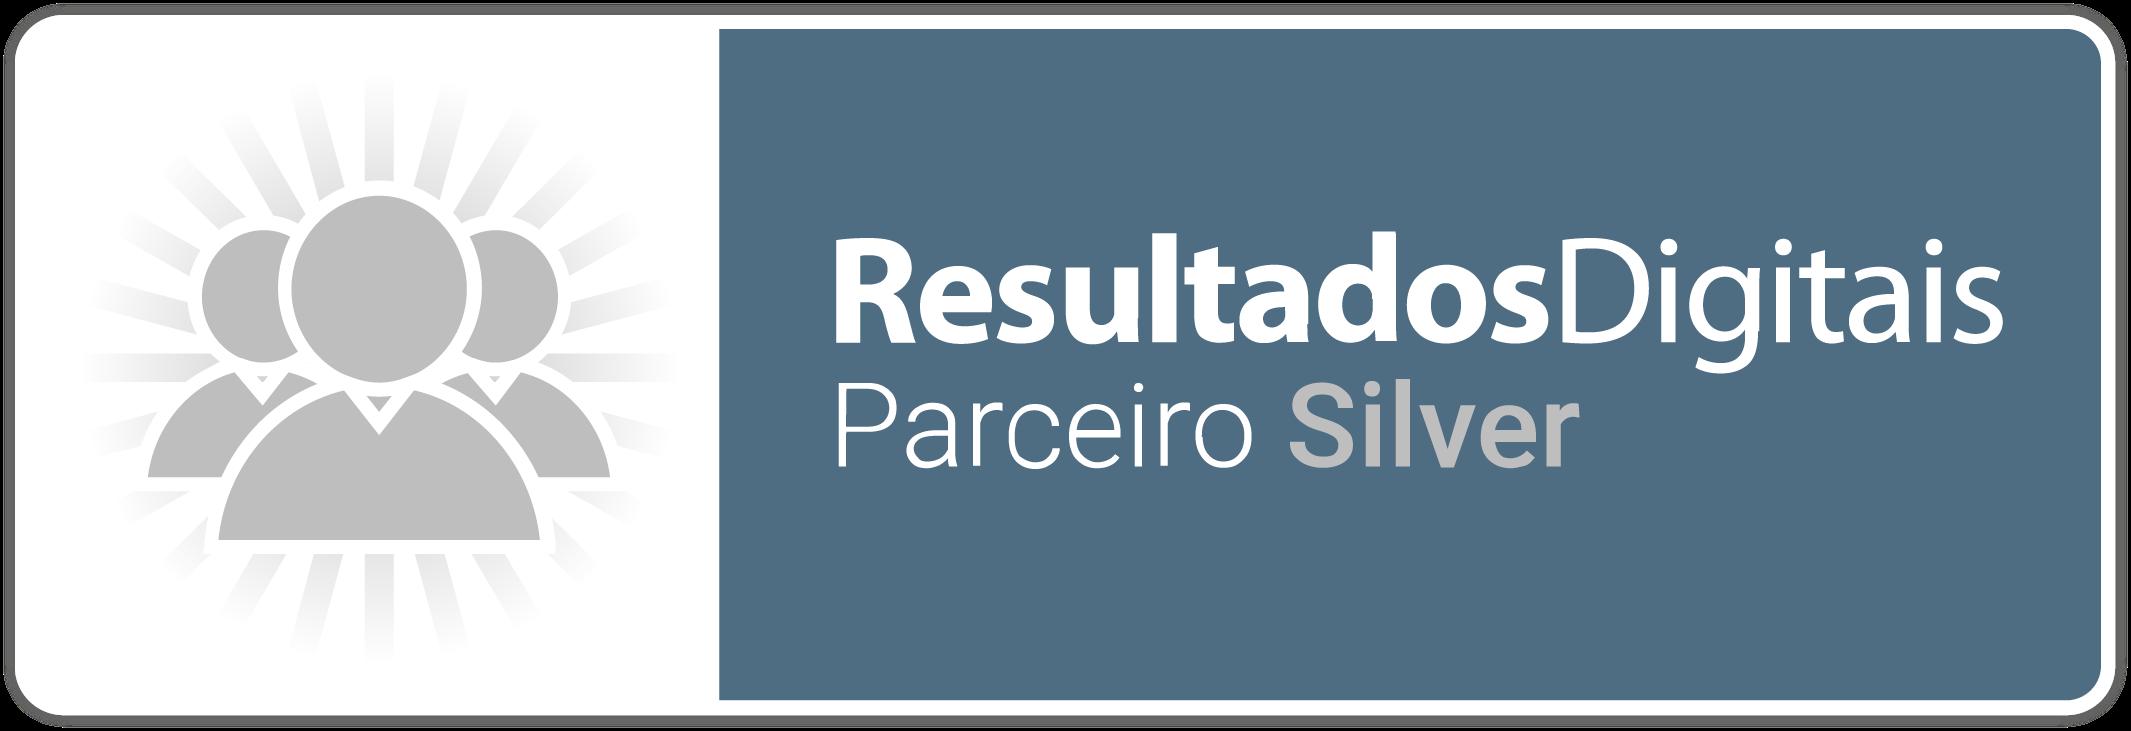 intermidias-rd-station-parceiro-silver